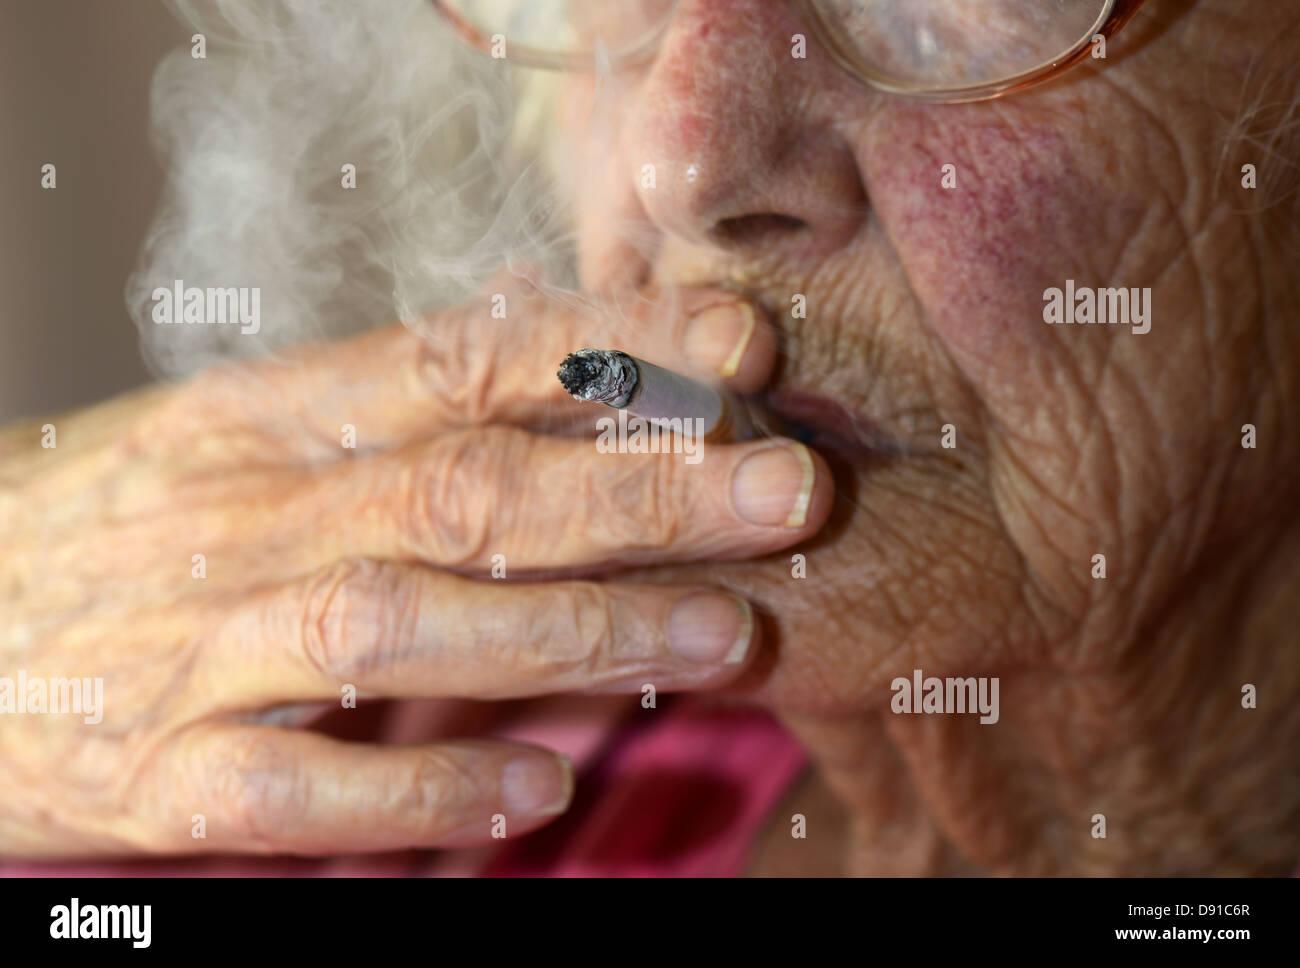 Old woman smoking, elderly woman smoker with a cigarette, elderly lady smoking - Stock Image